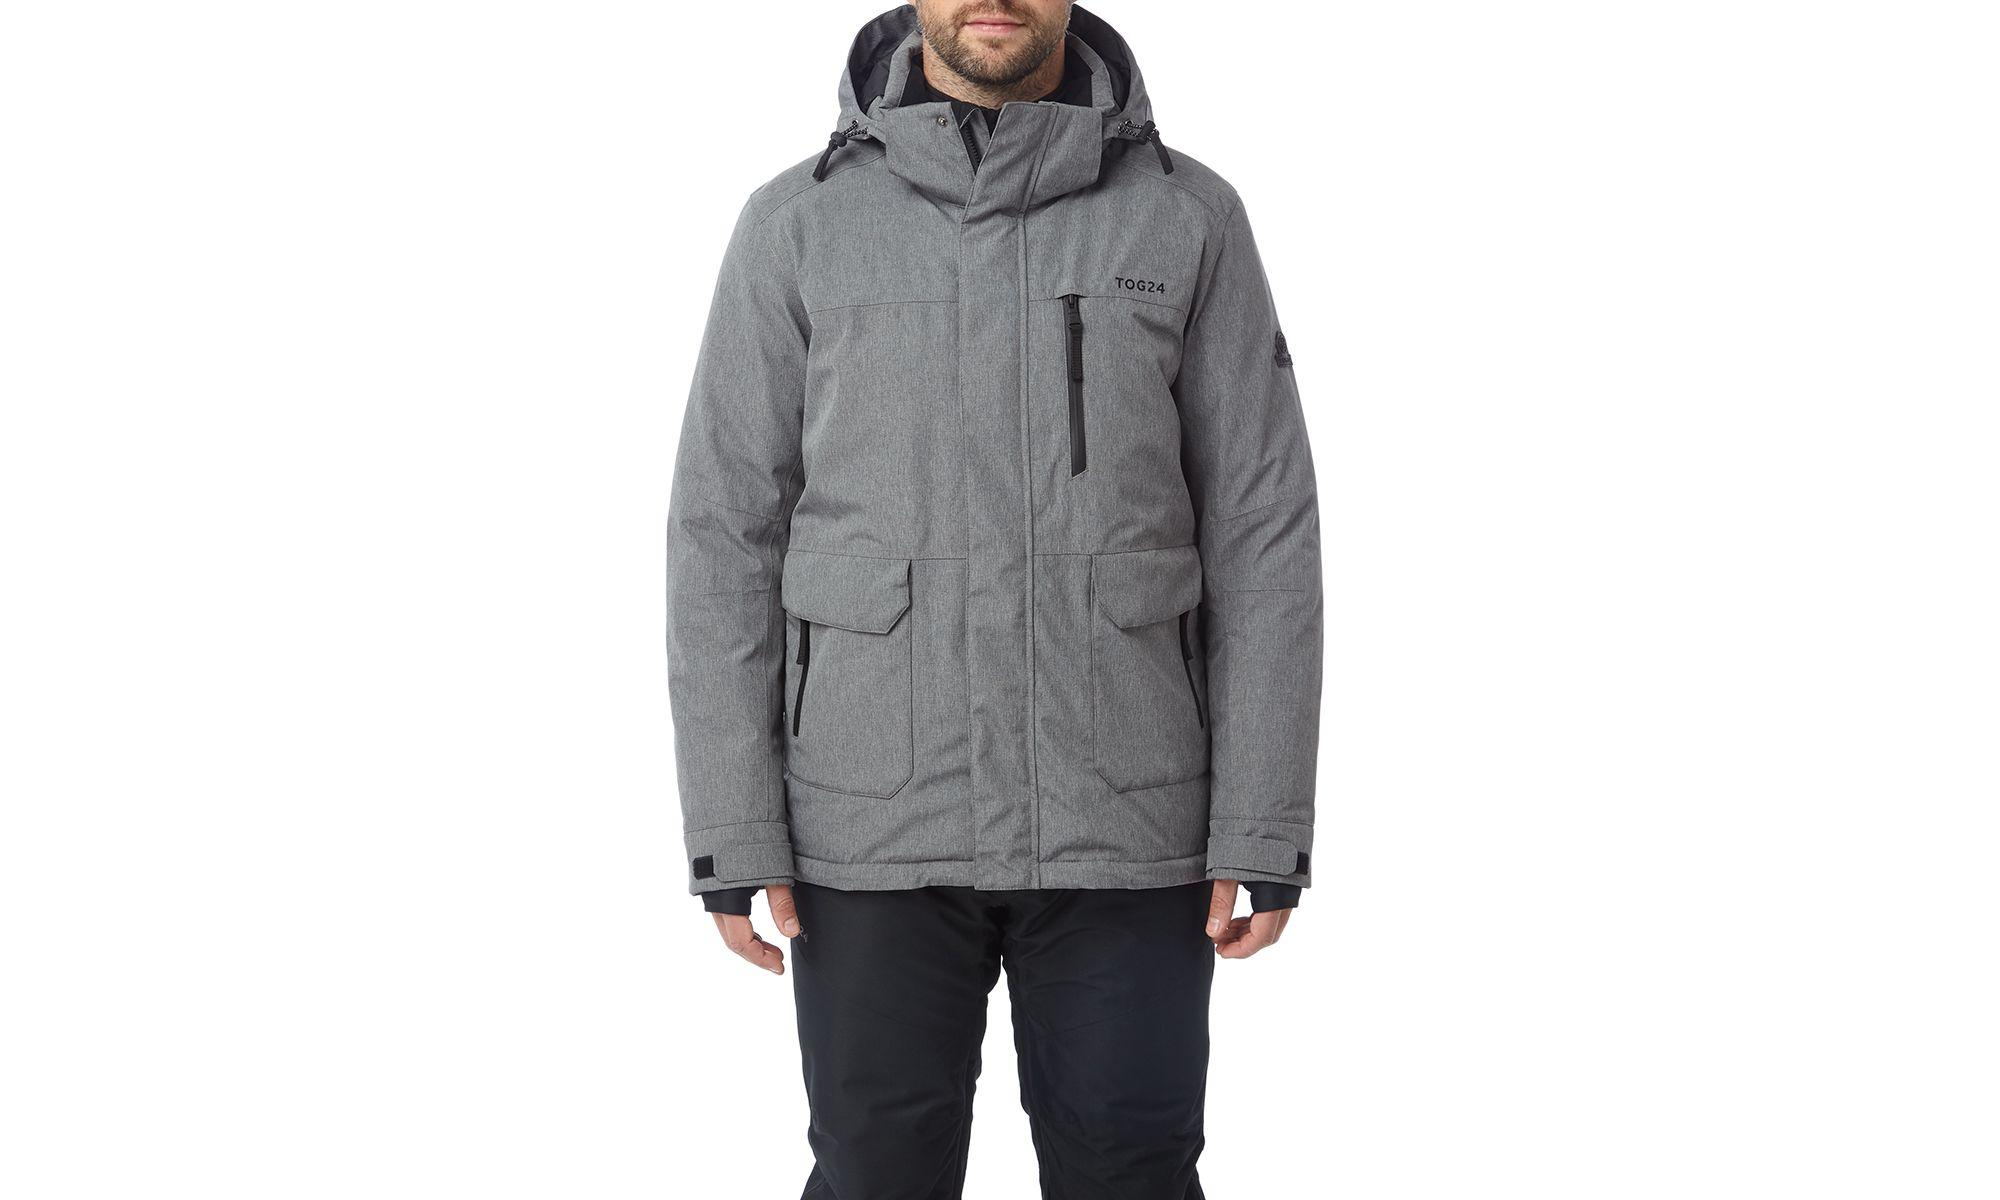 ... Grey Marl Vertigo Mens Waterproof Insulated Ski Jacket for Men - Lyst.  View fullscreen 1ecb74760